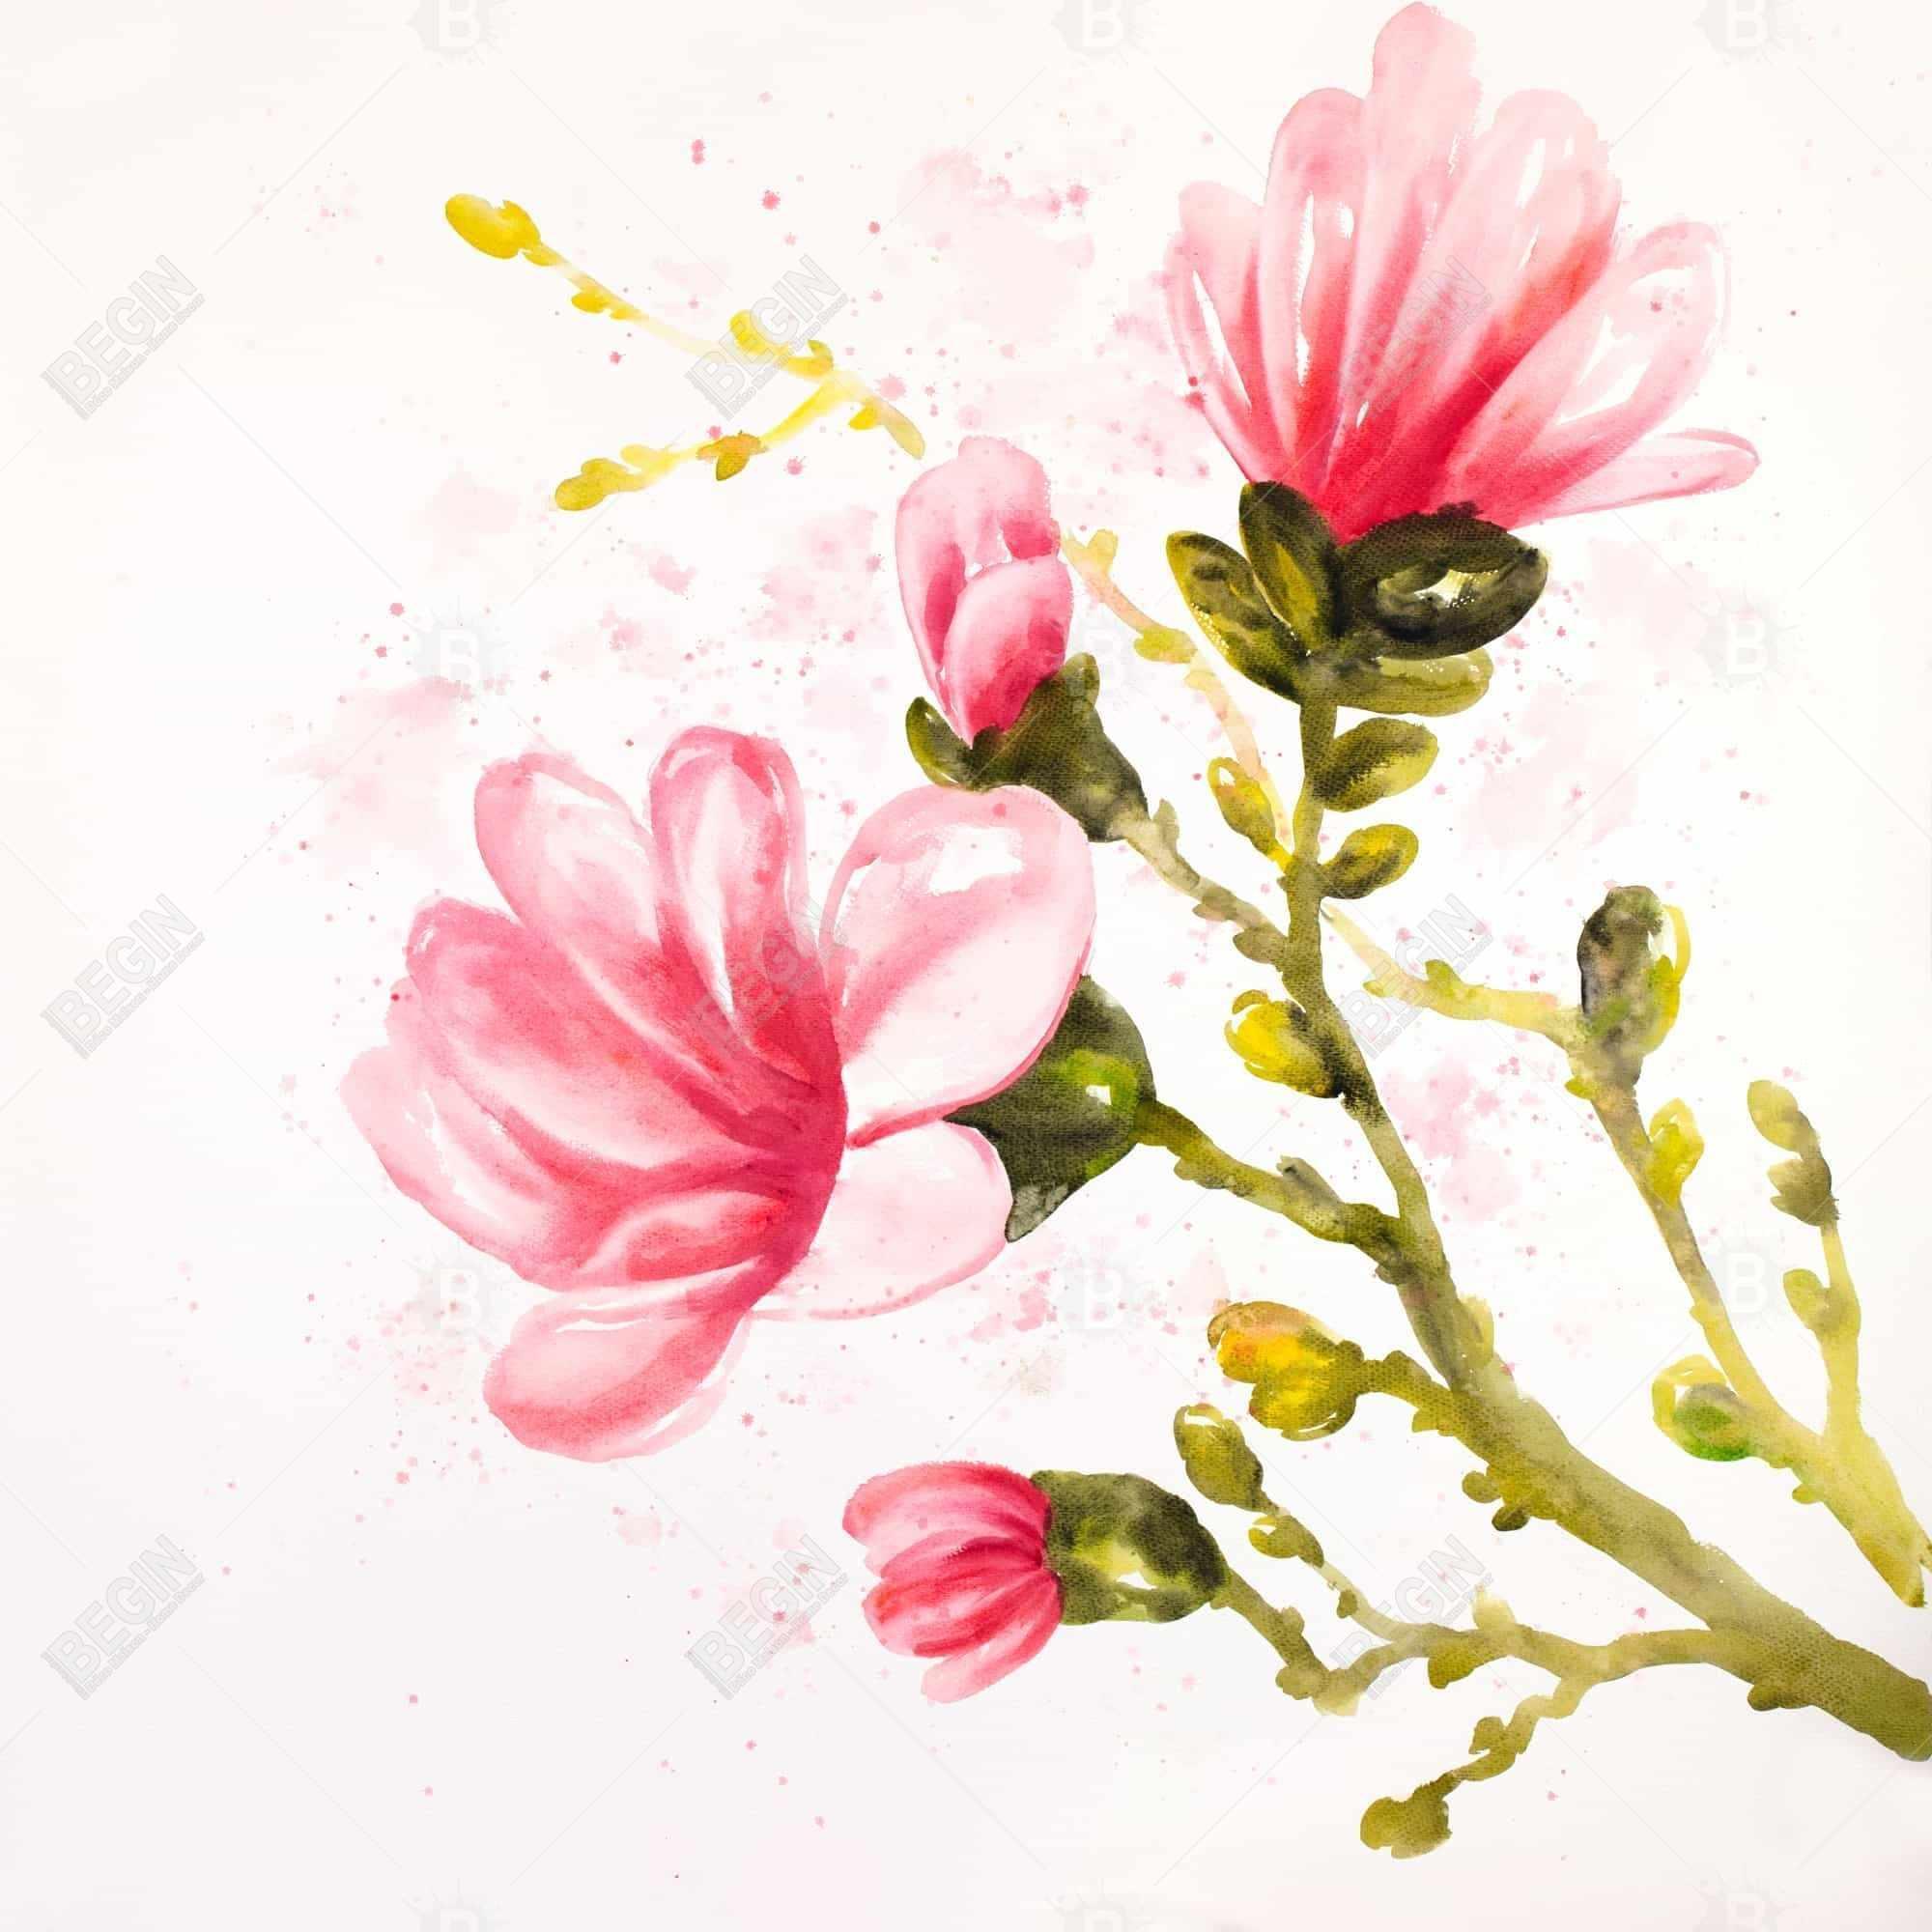 Watercolor magnolia flowers